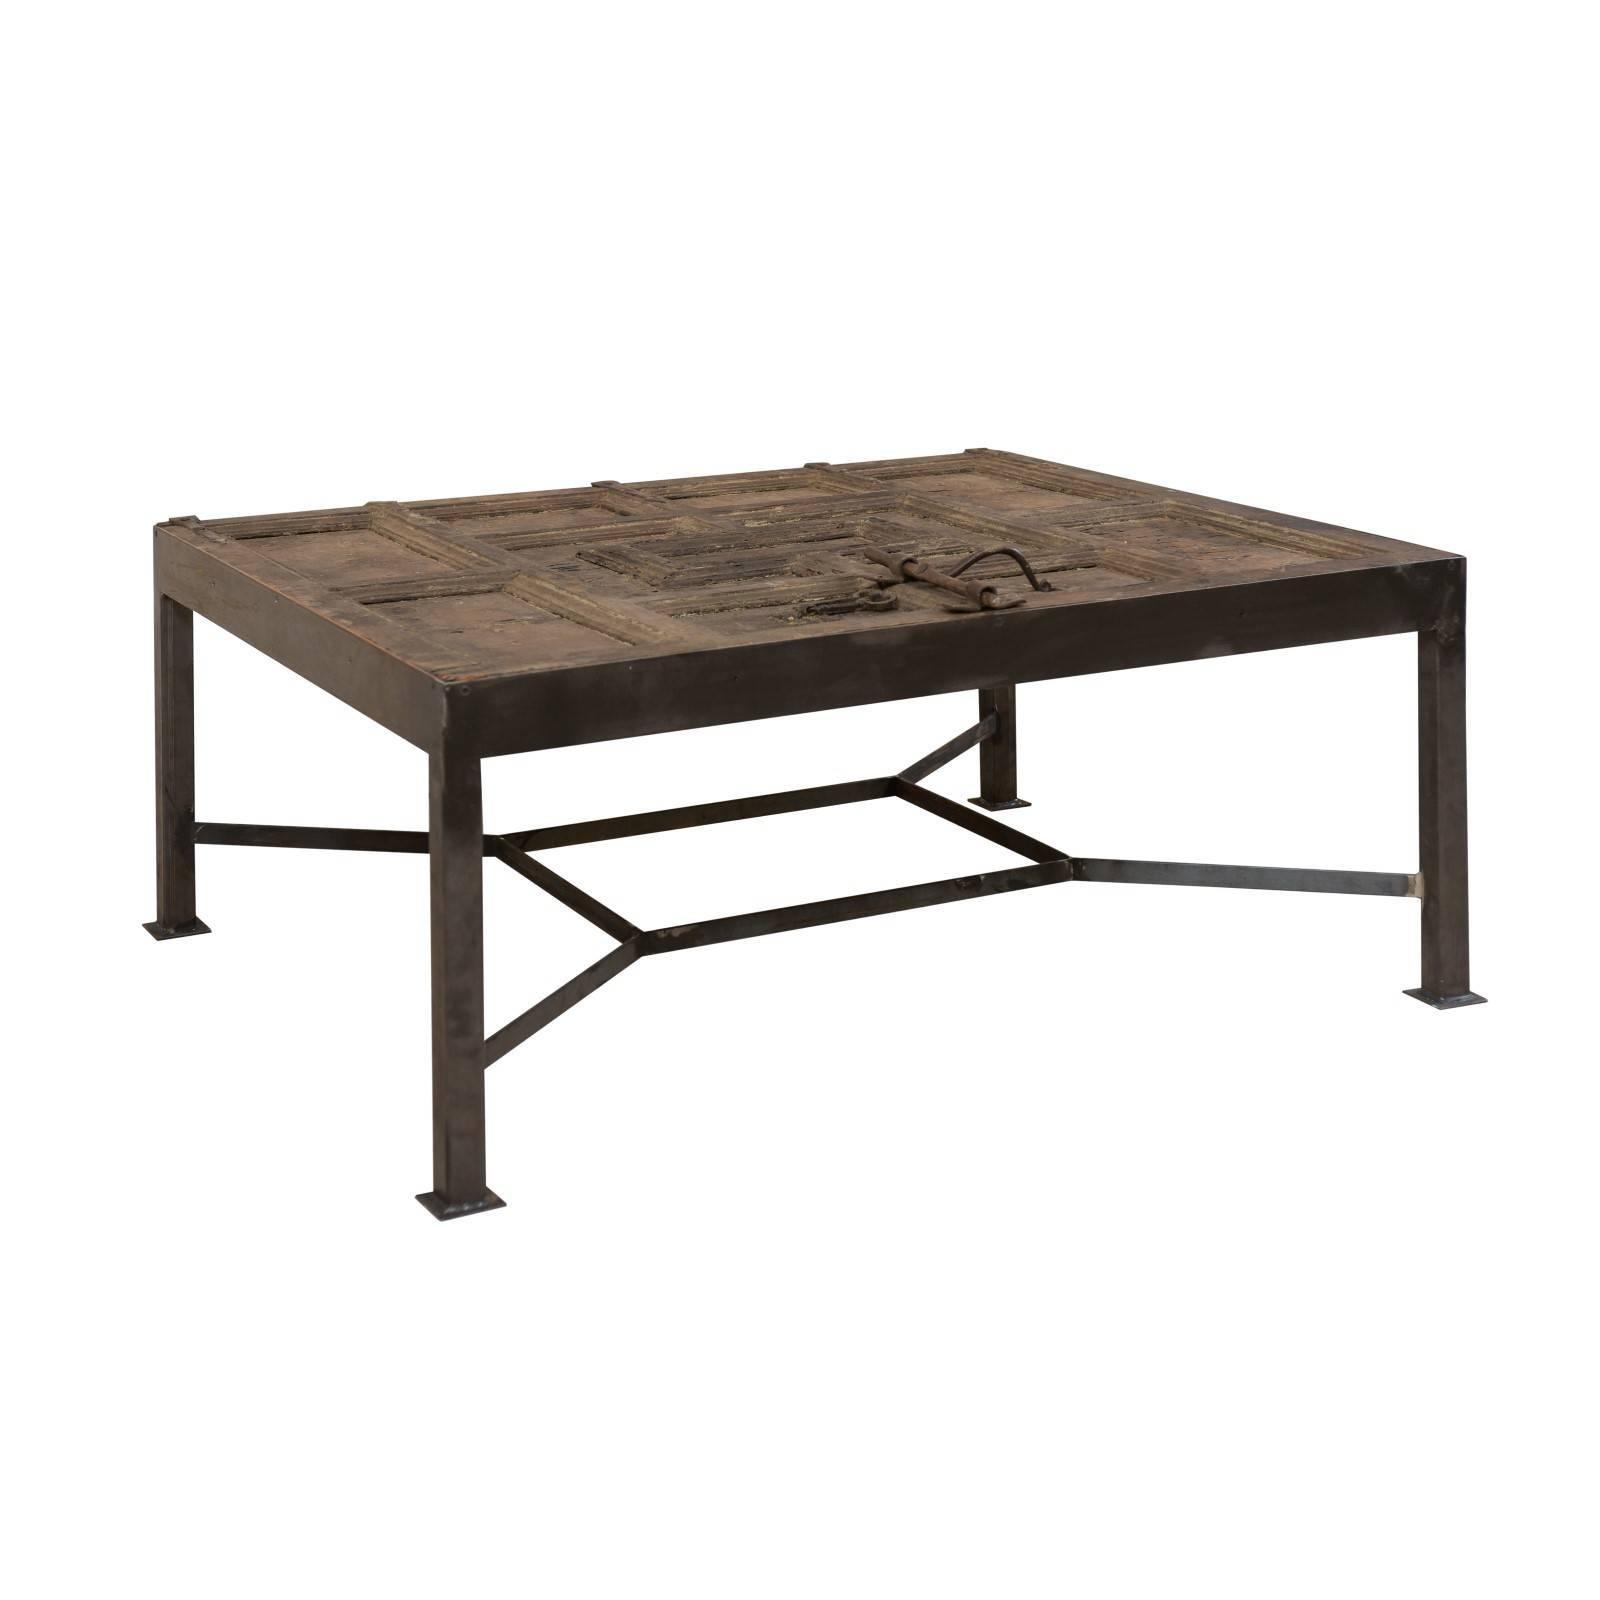 Unique & Custom Designed Coffee Table w/ an 18th Century Spanish Door Top